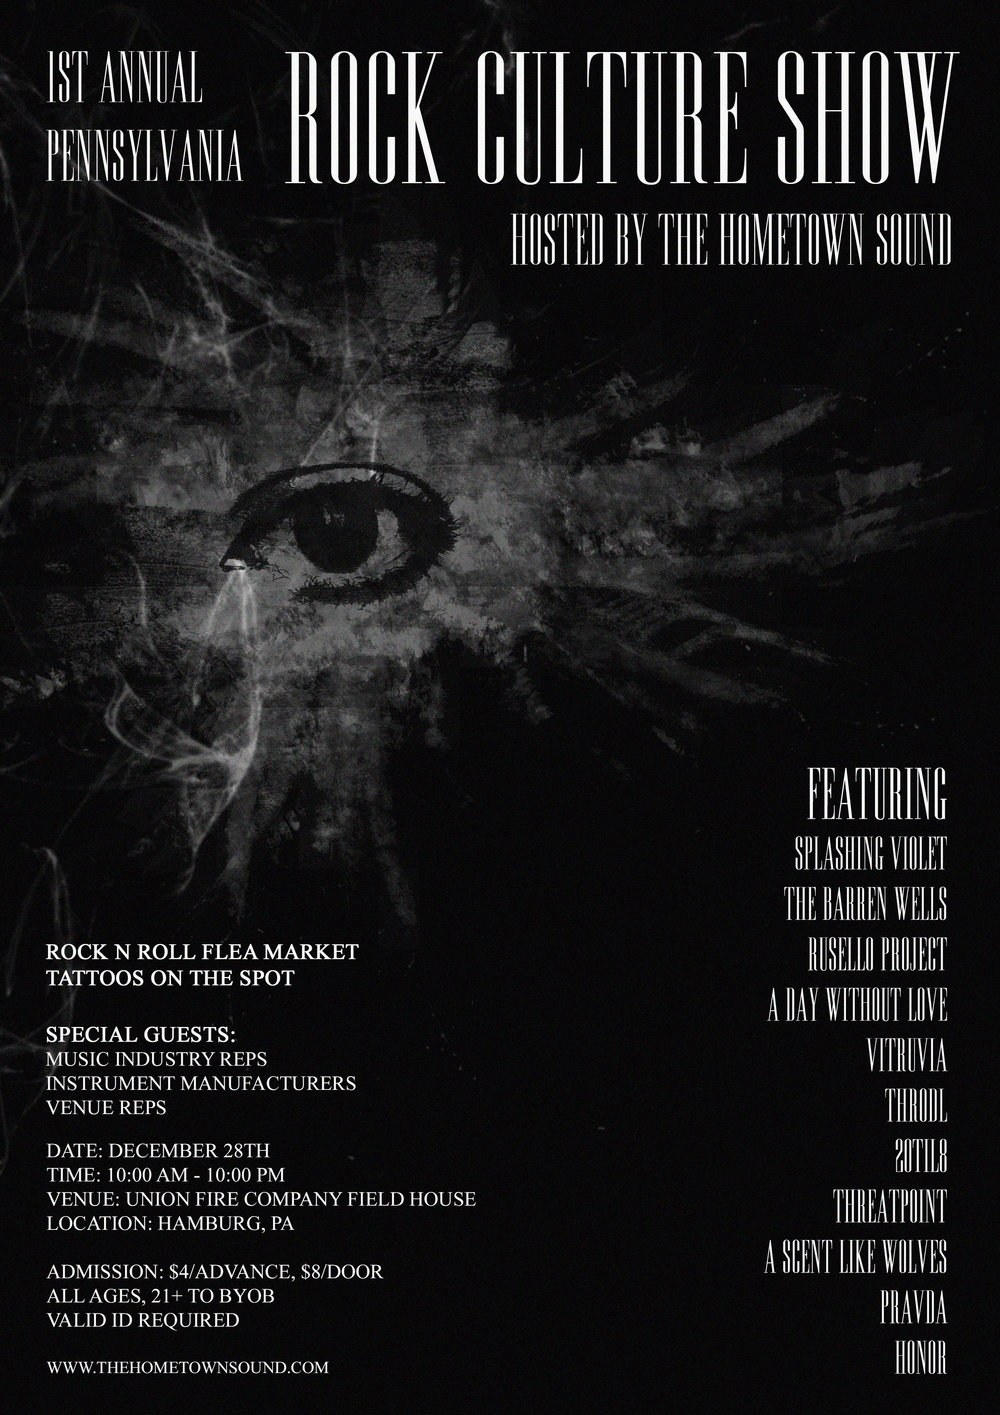 Rock Culture Show Poster.jpg